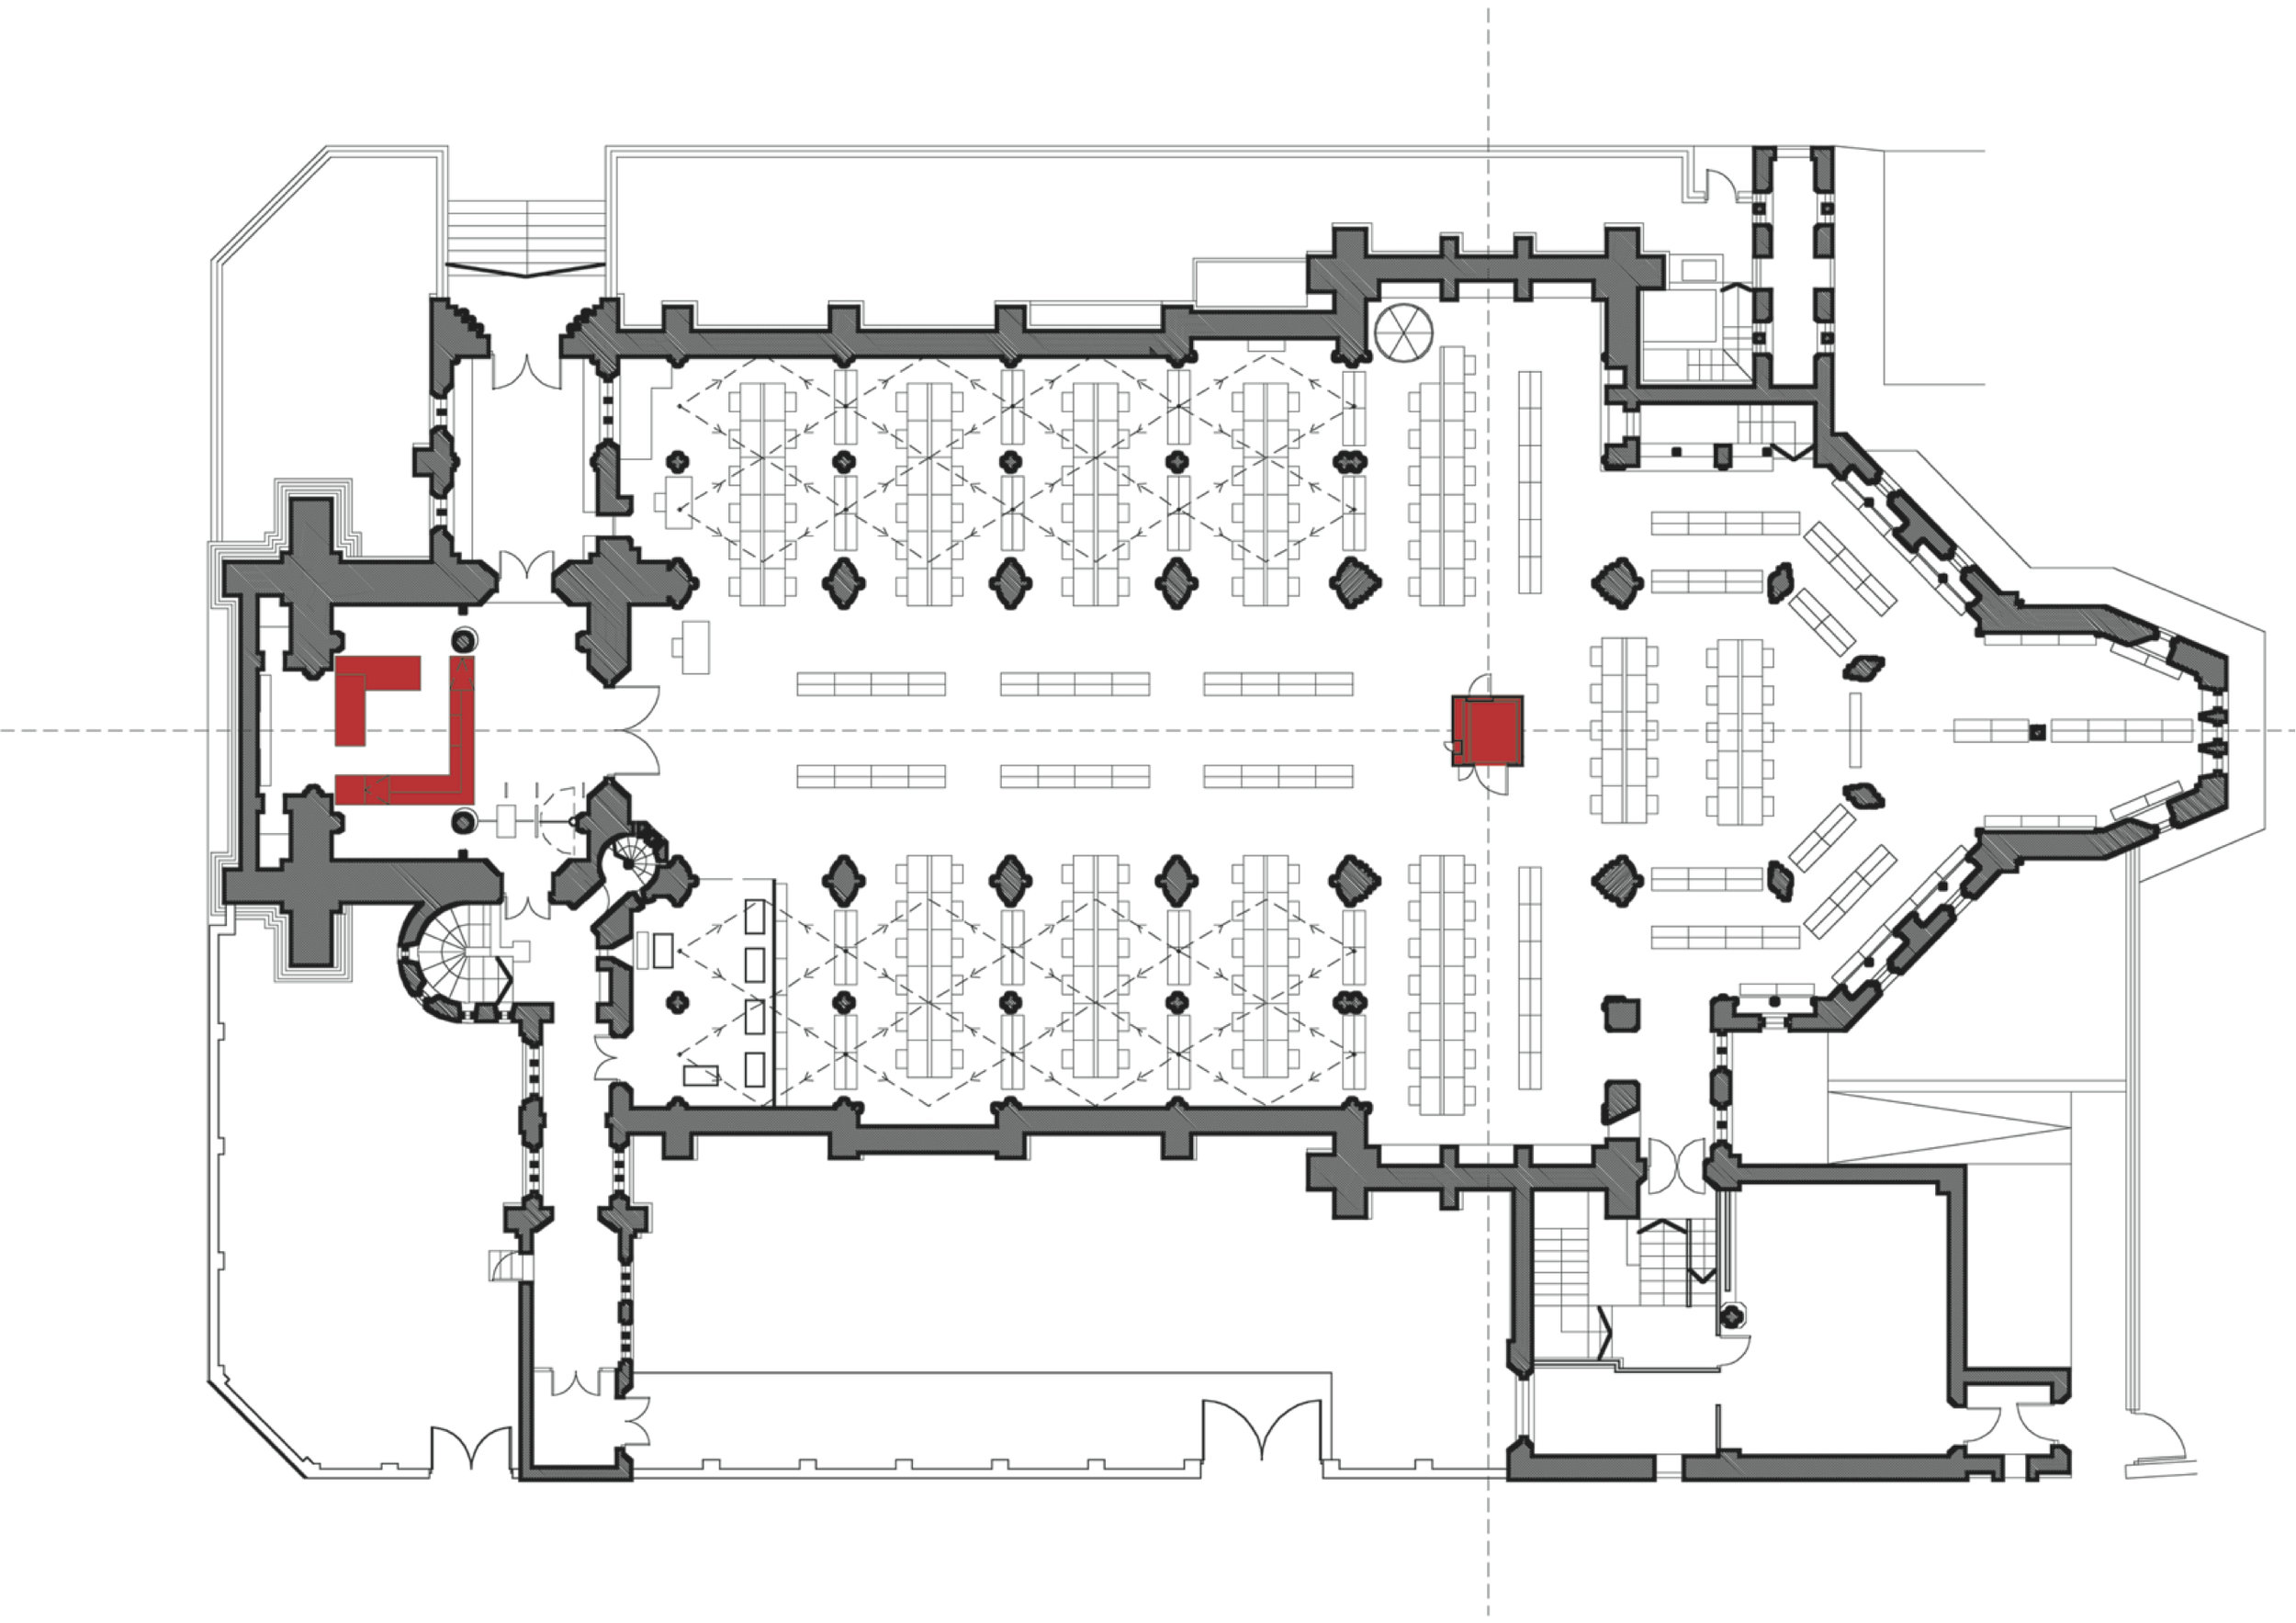 QMUL Medical School Library plan